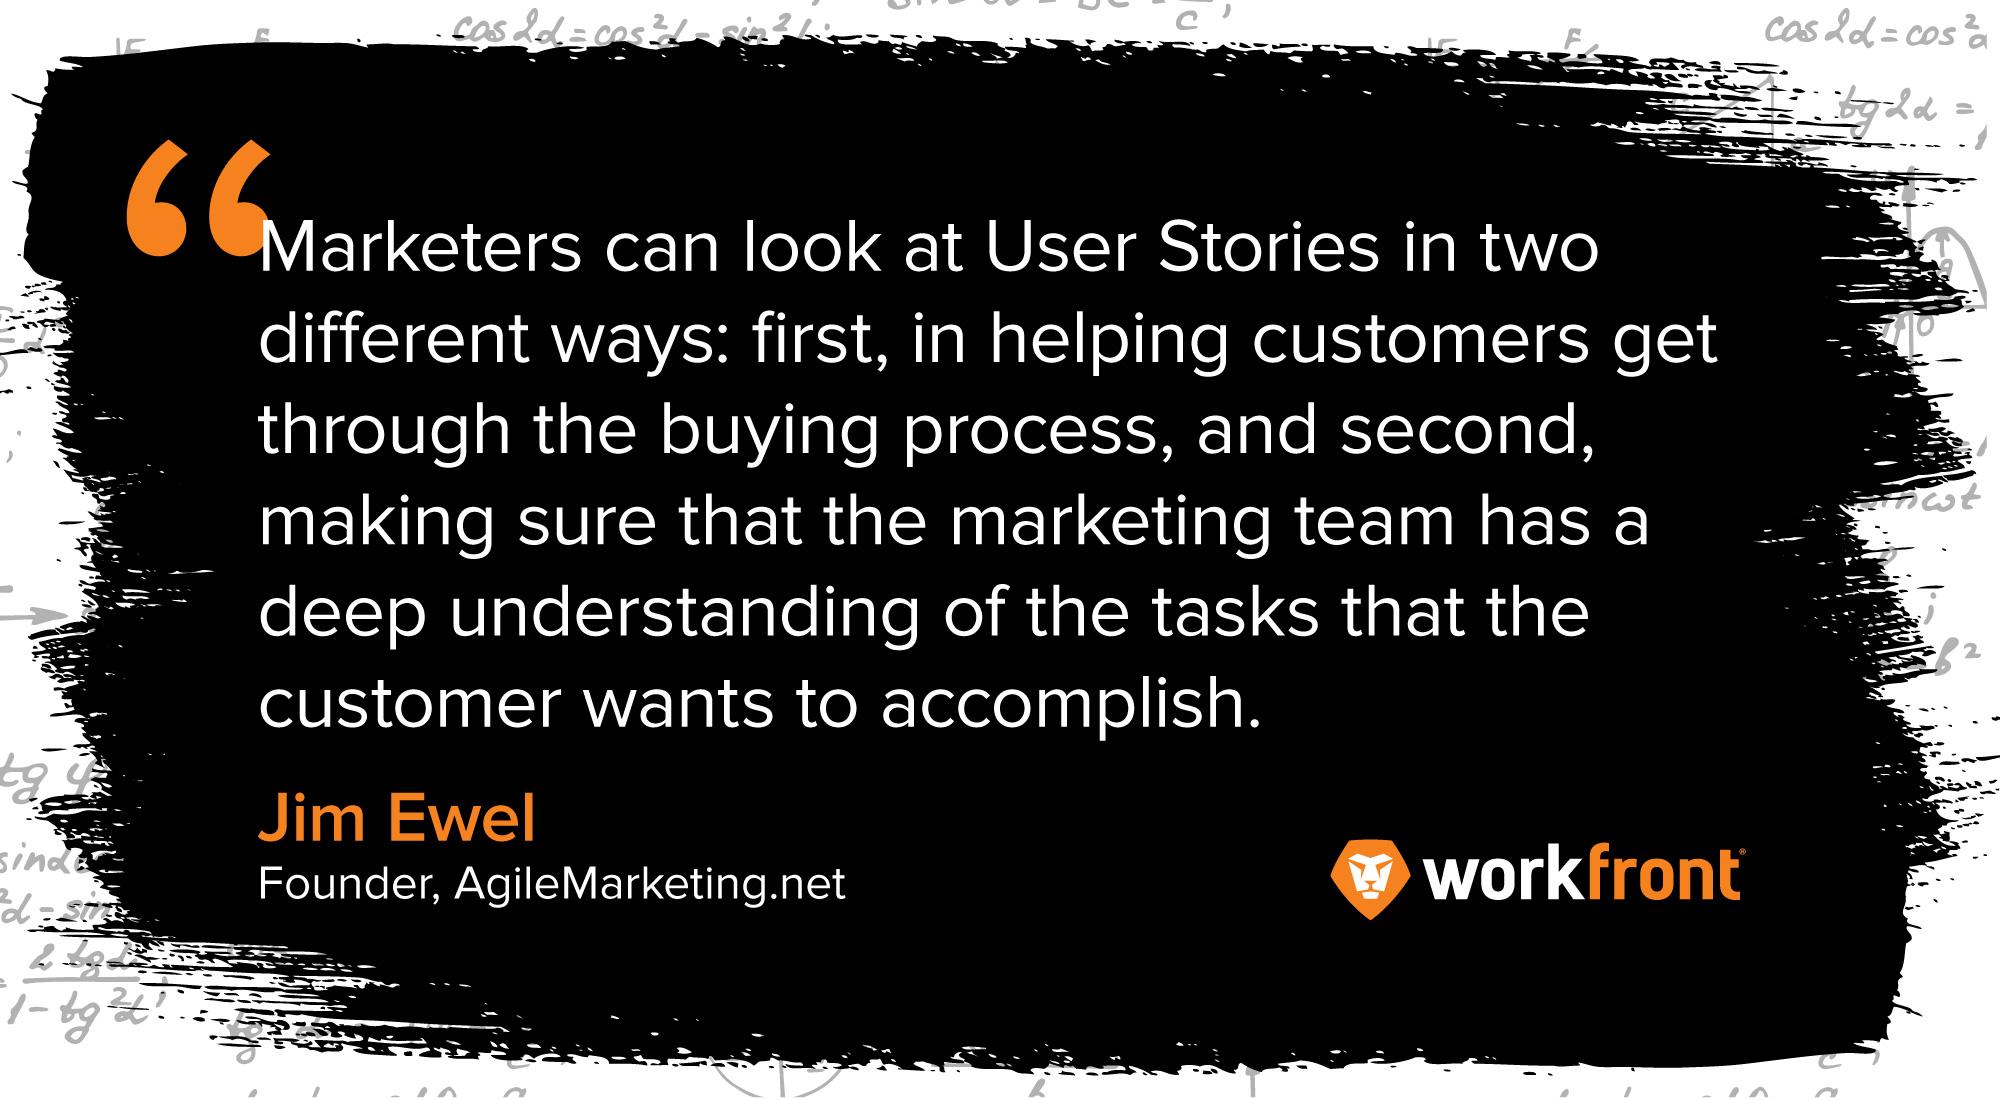 jim ewel quote agile marketer user stories